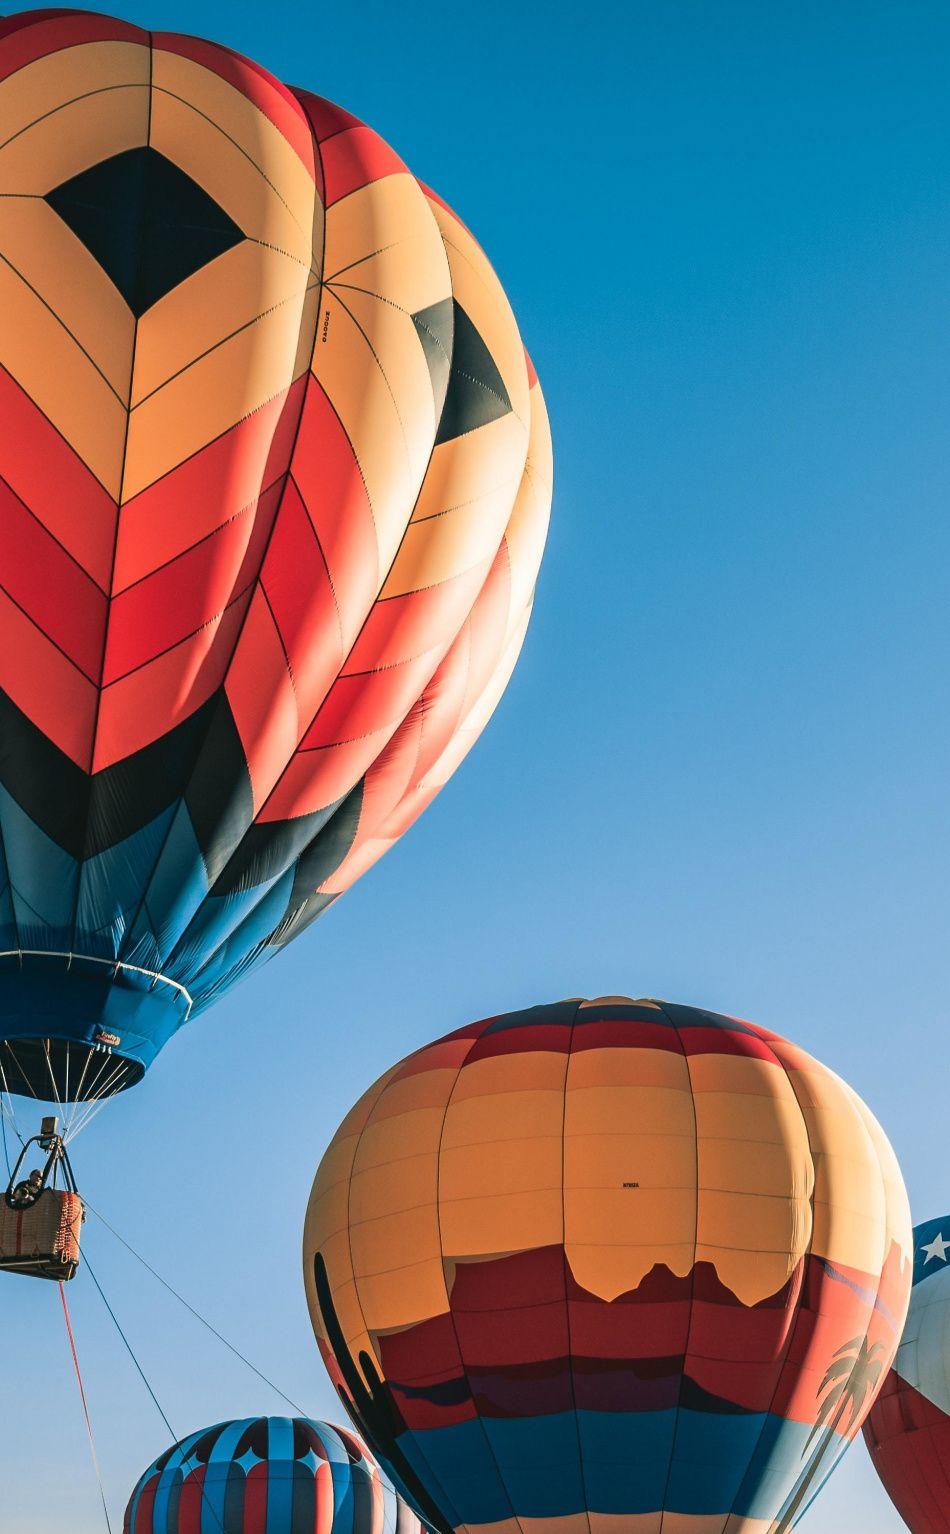 950x1534 Colorful Hot Air Balloons Festival Wallpaper Air Balloon Hot Air Hot Air Balloon Wallpaper colorful hot air balloon blue